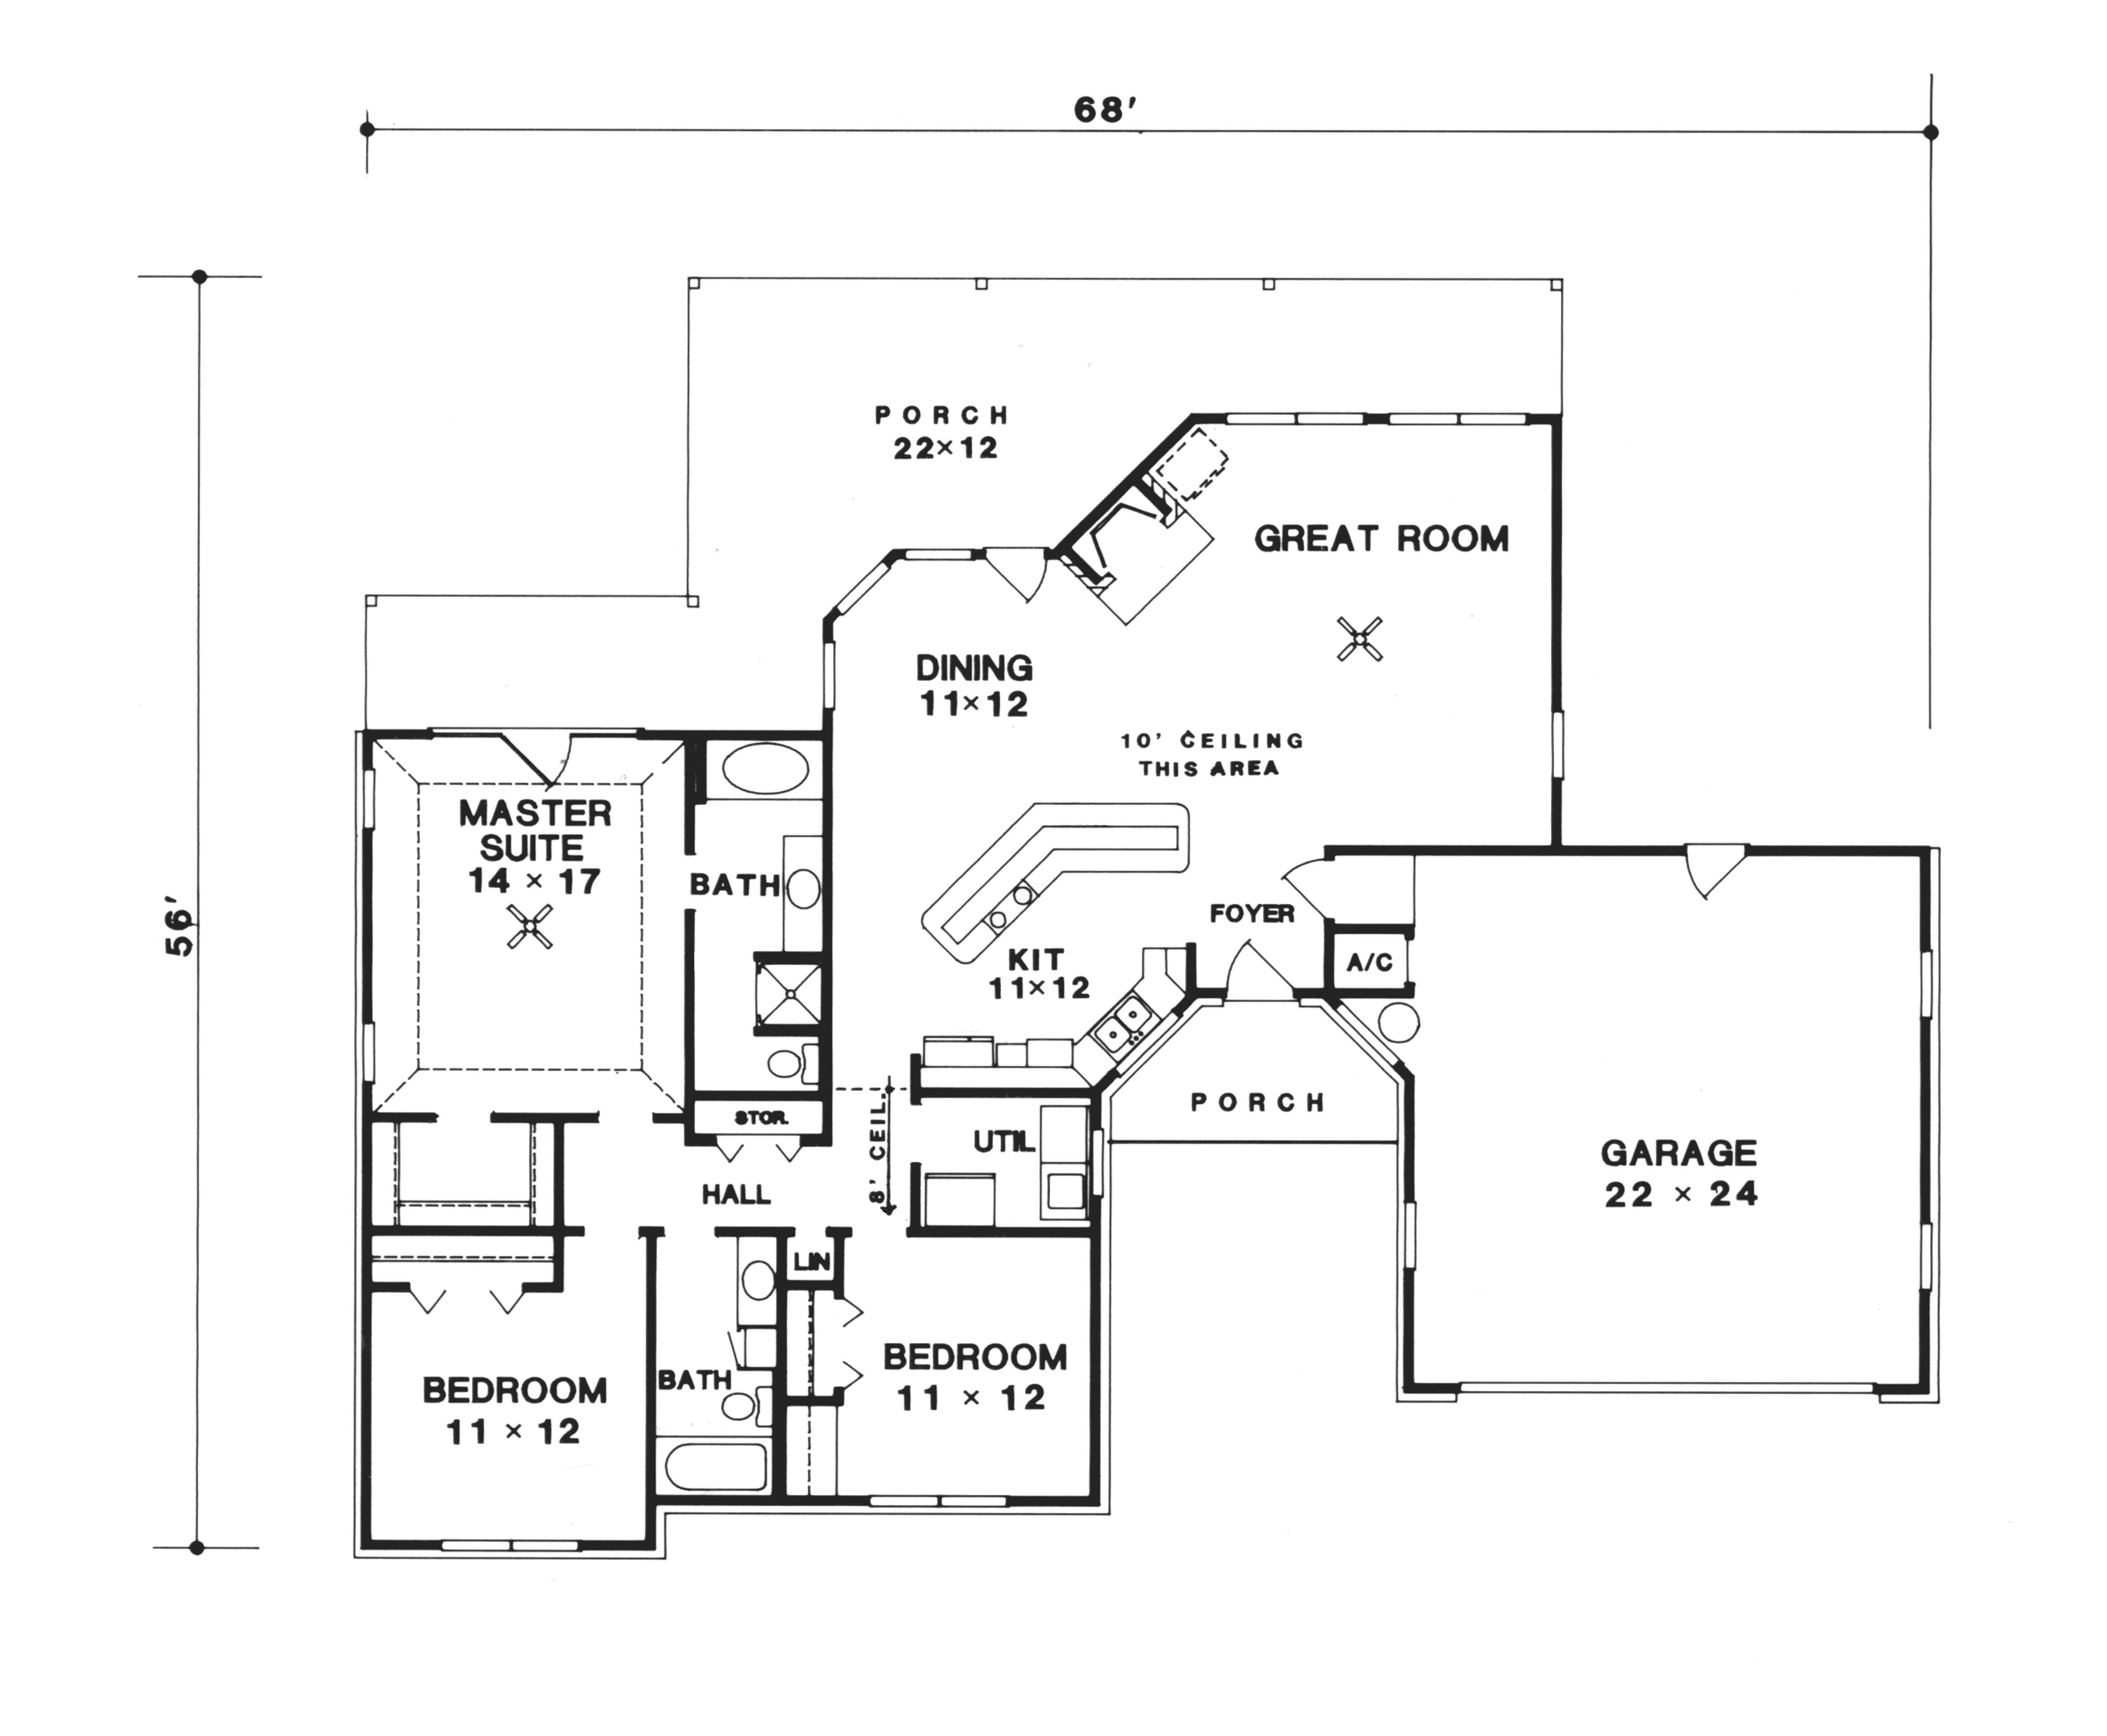 ba nursery custom homes floor plans custom home floor plans throughout custom house plans